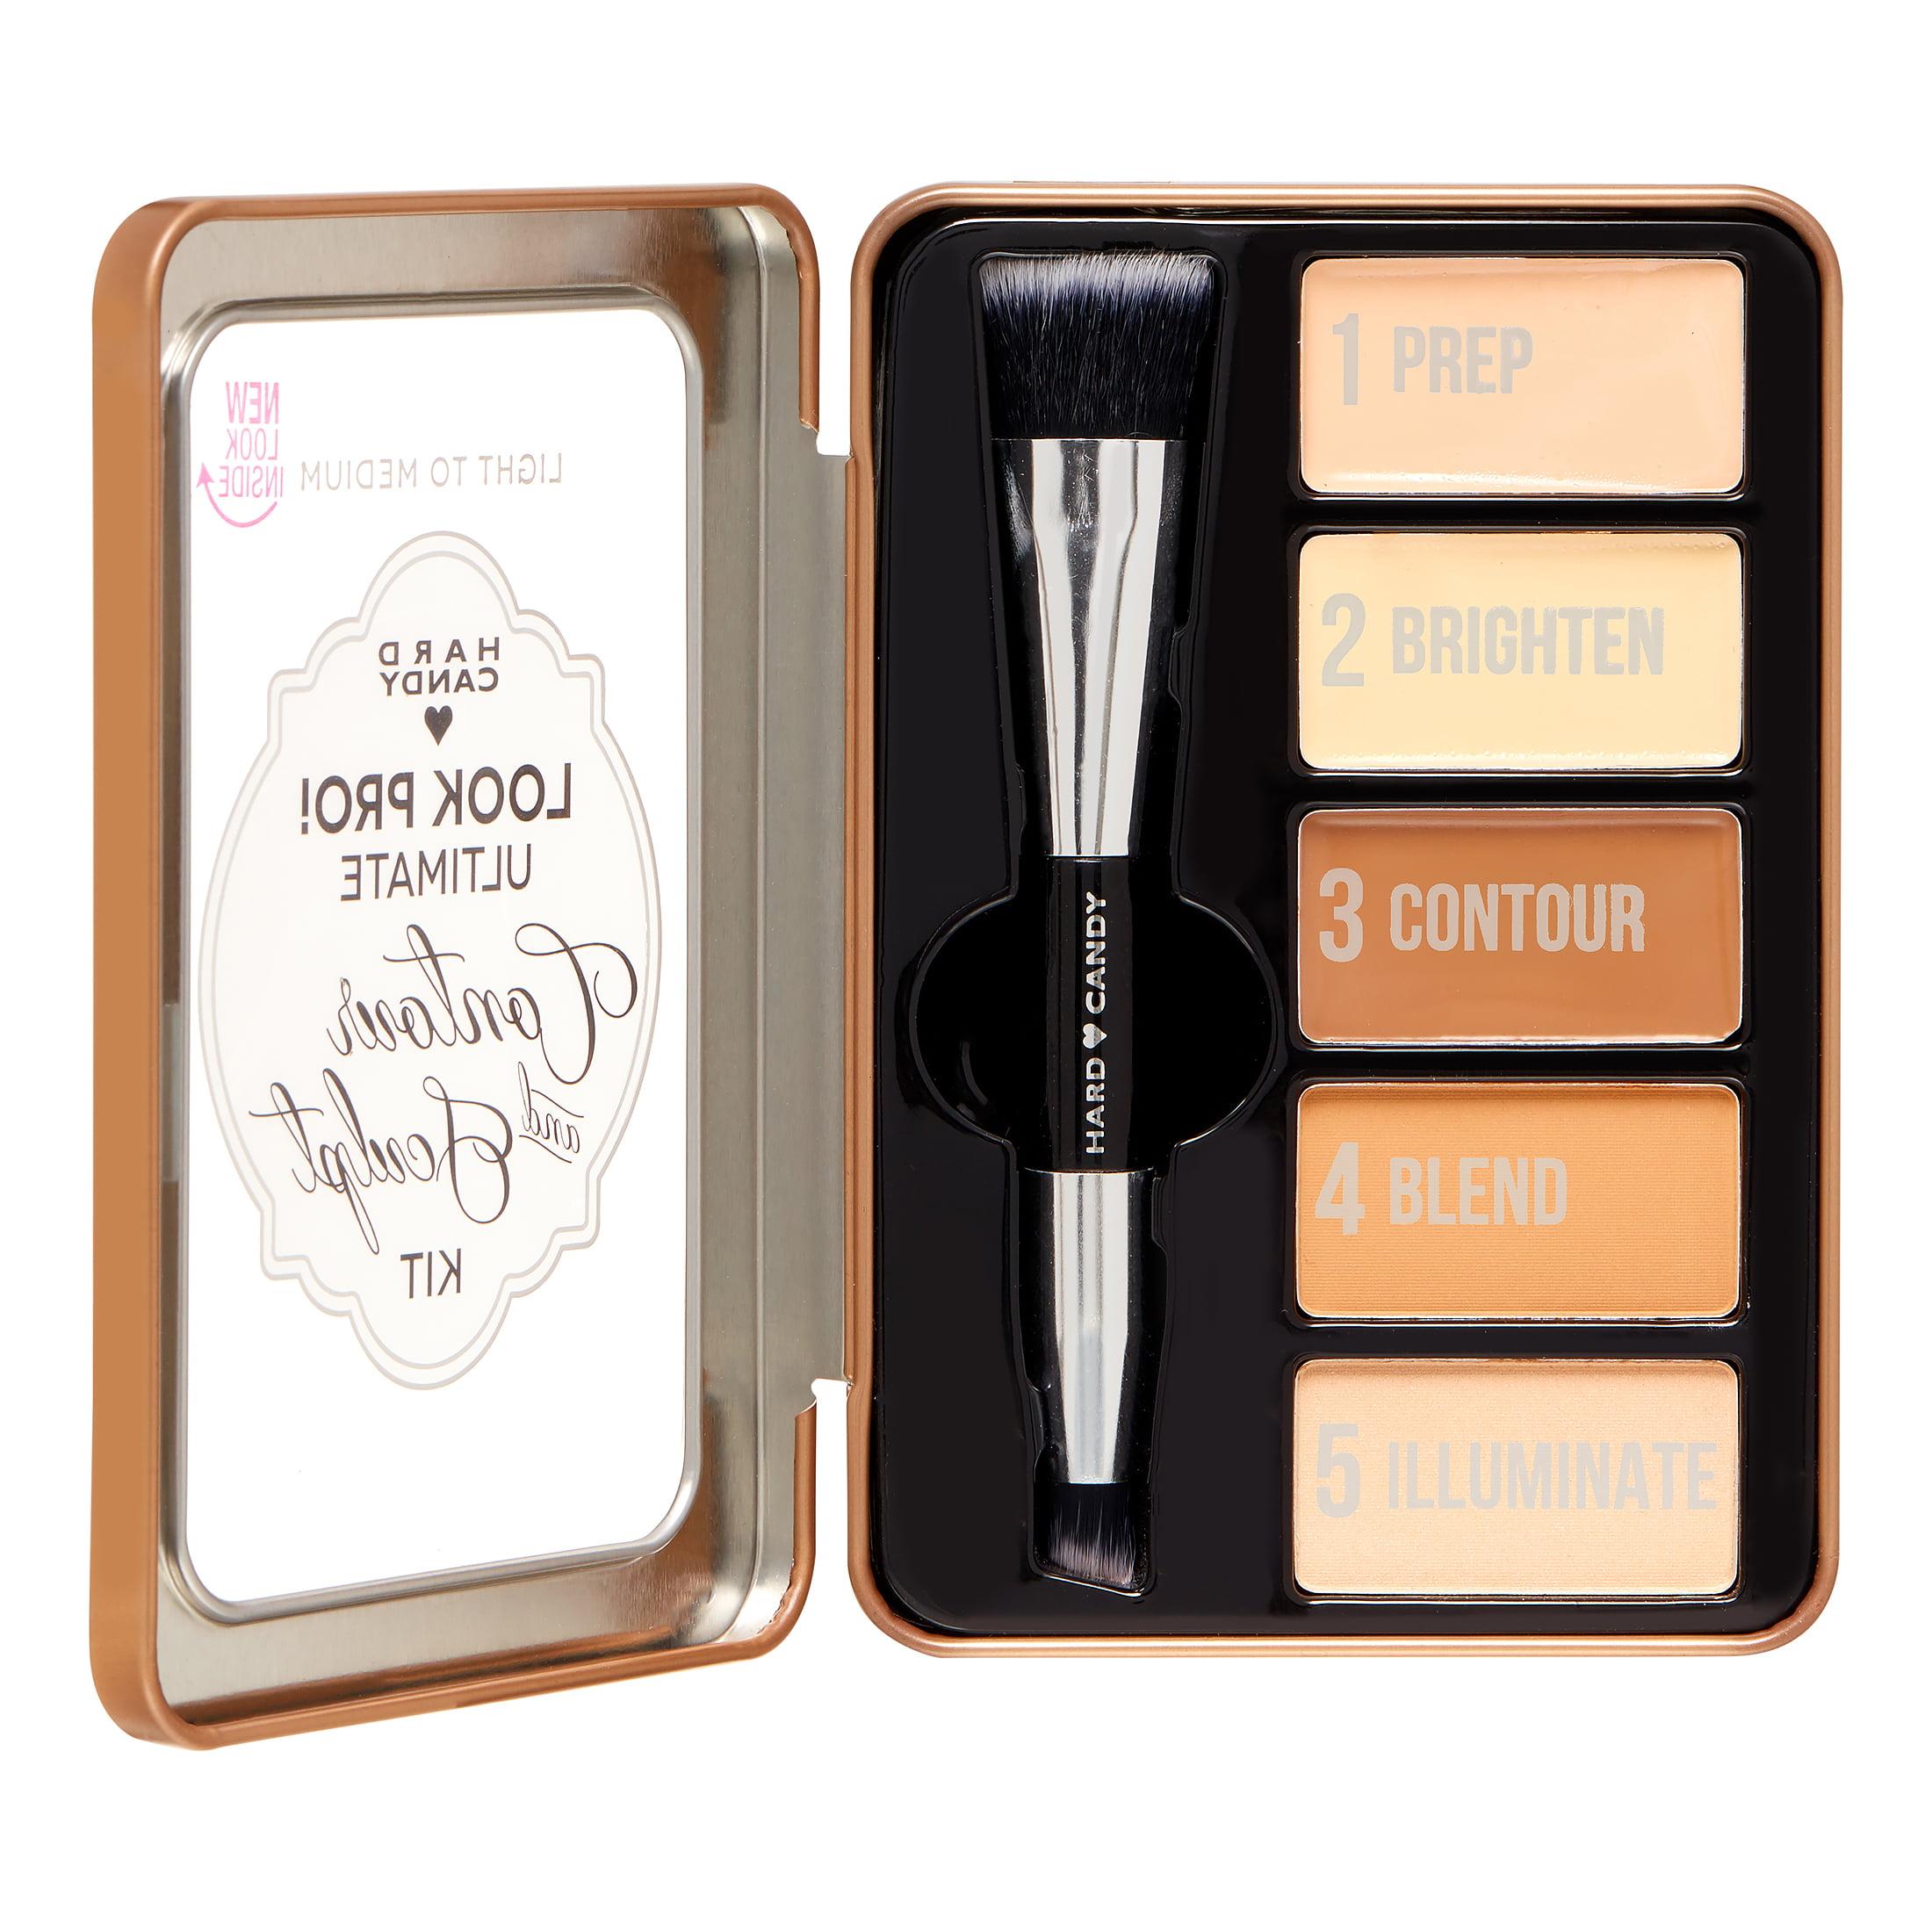 Hard Candy Look Pro! Ultimate Kit, 1099 Light-Med, 0.33 oz